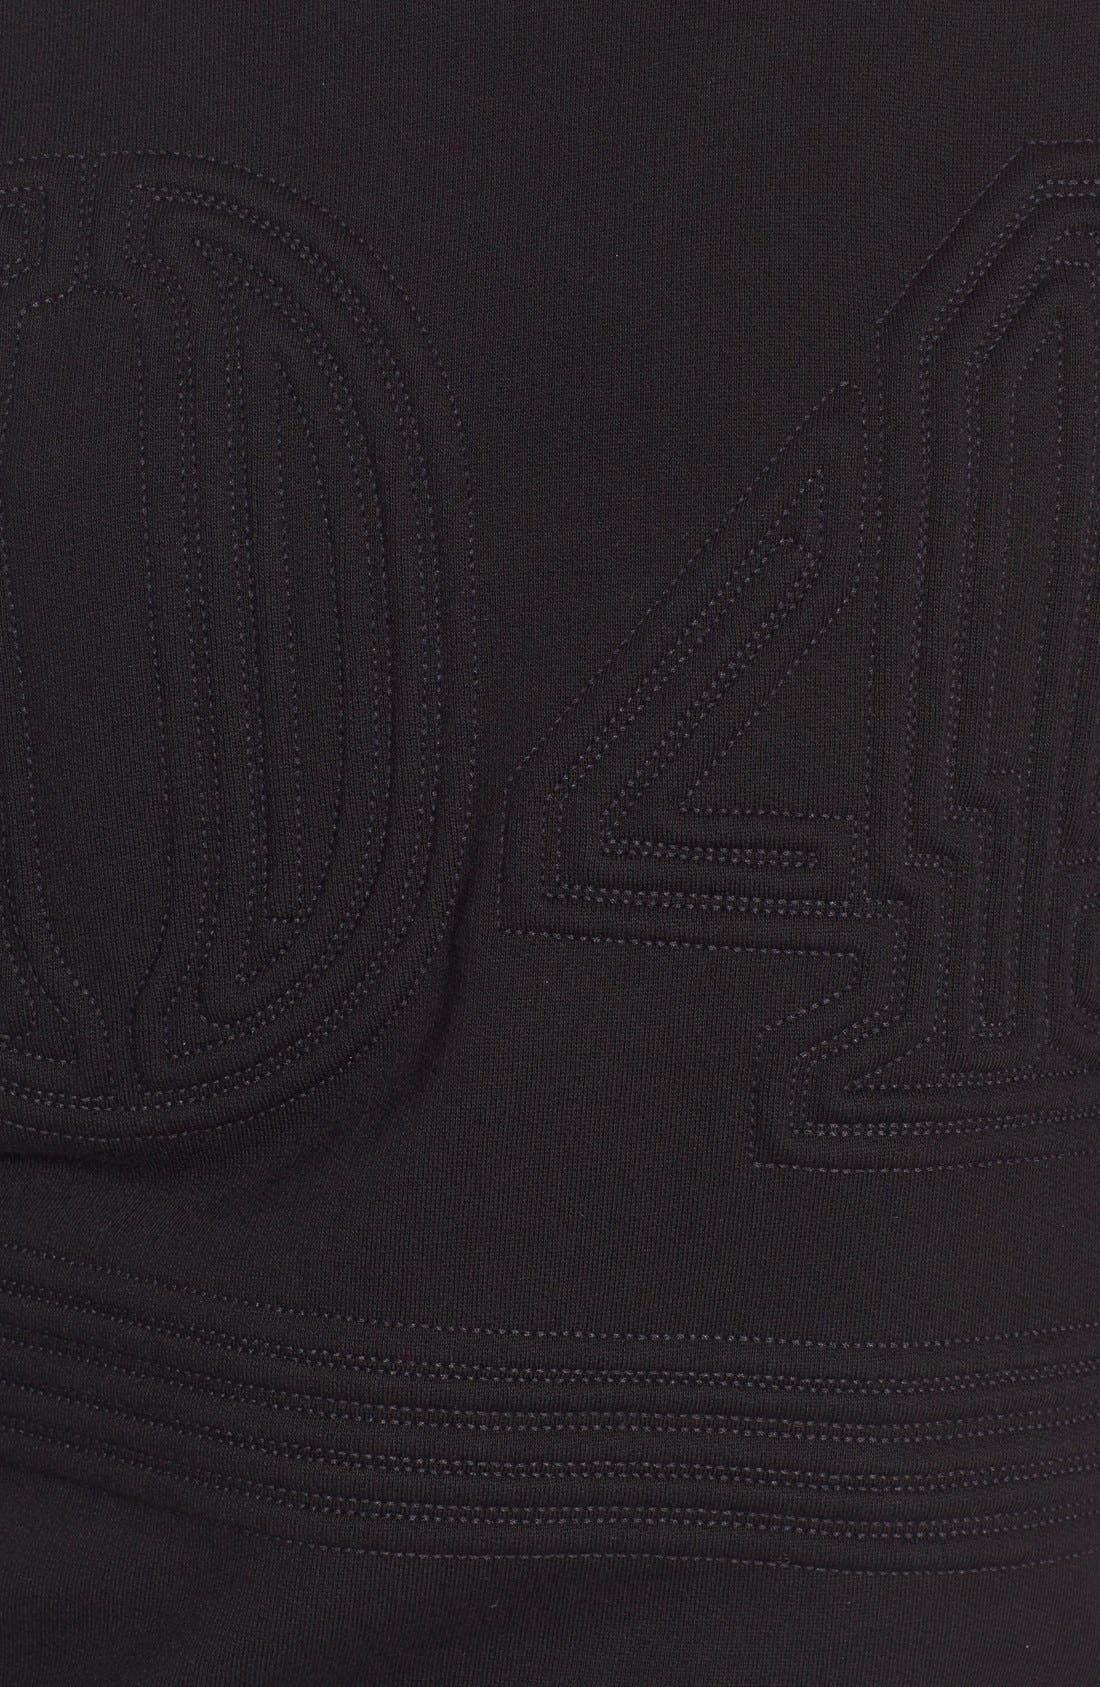 Corded 04 Sweatshirt,                             Main thumbnail 1, color,                             001